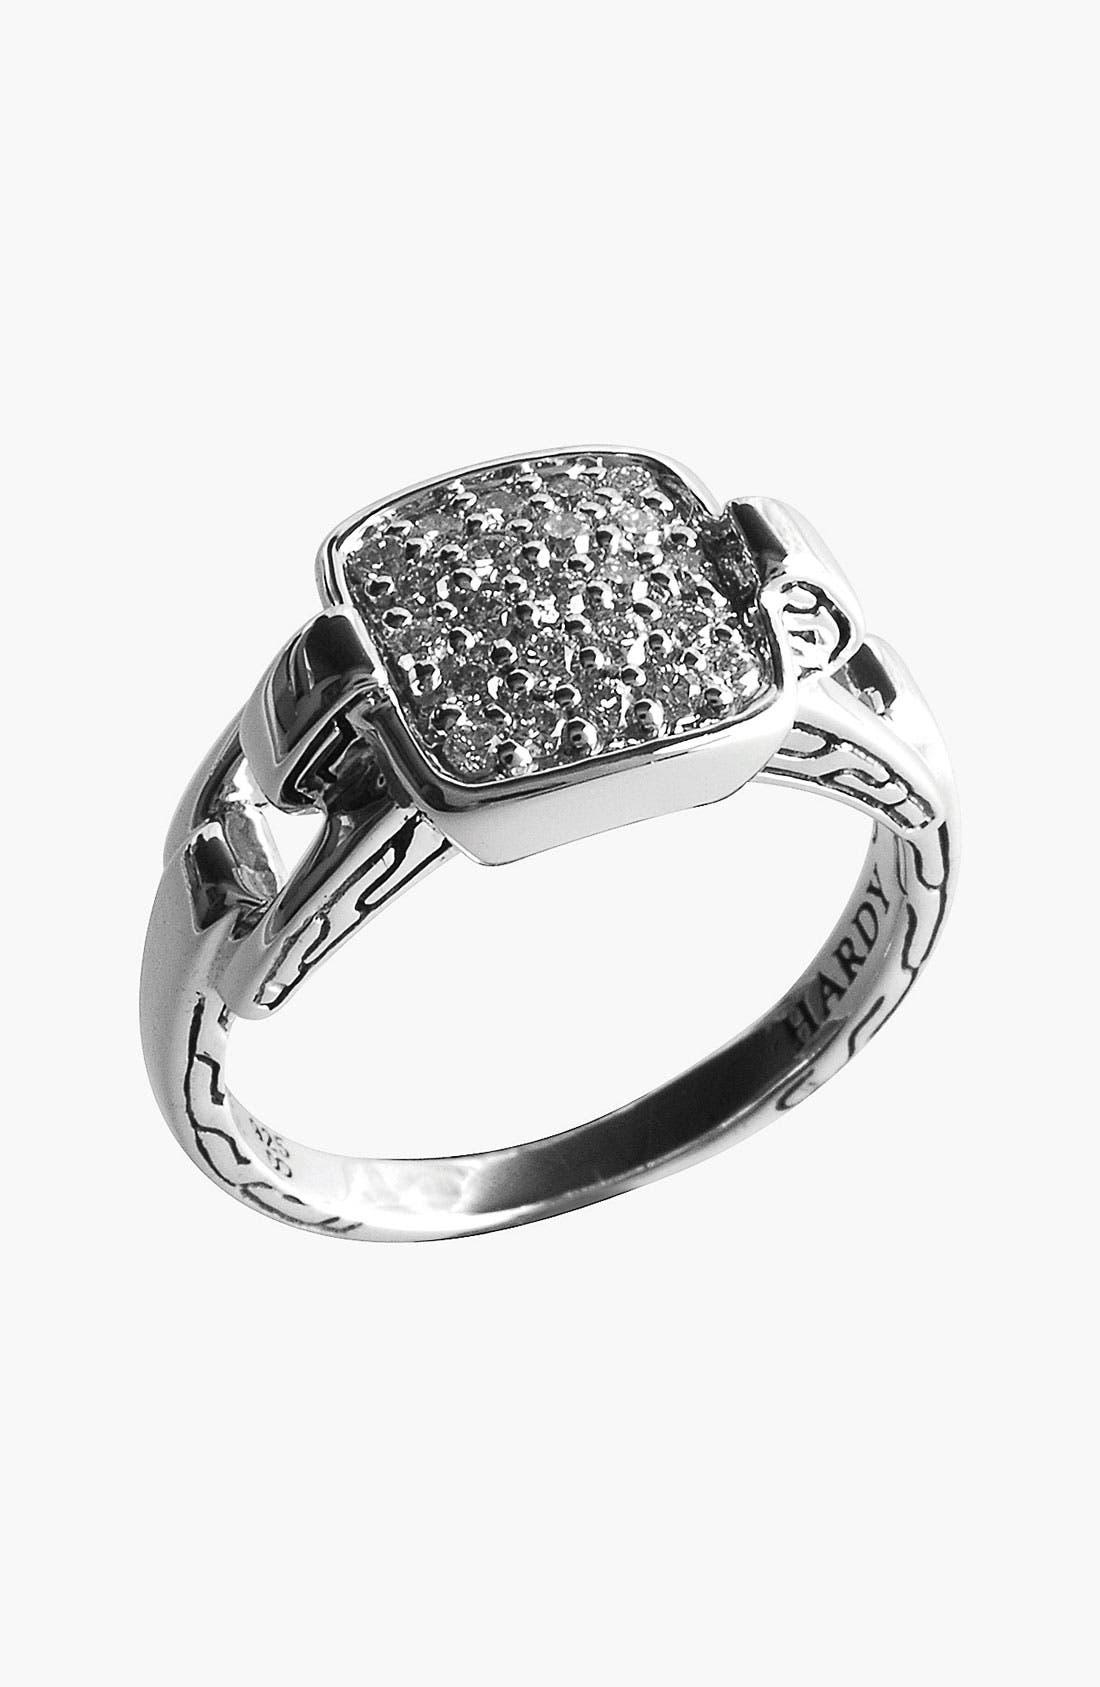 Alternate Image 1 Selected - John Hardy 'Classic Chain' Rectangular Diamond Ring